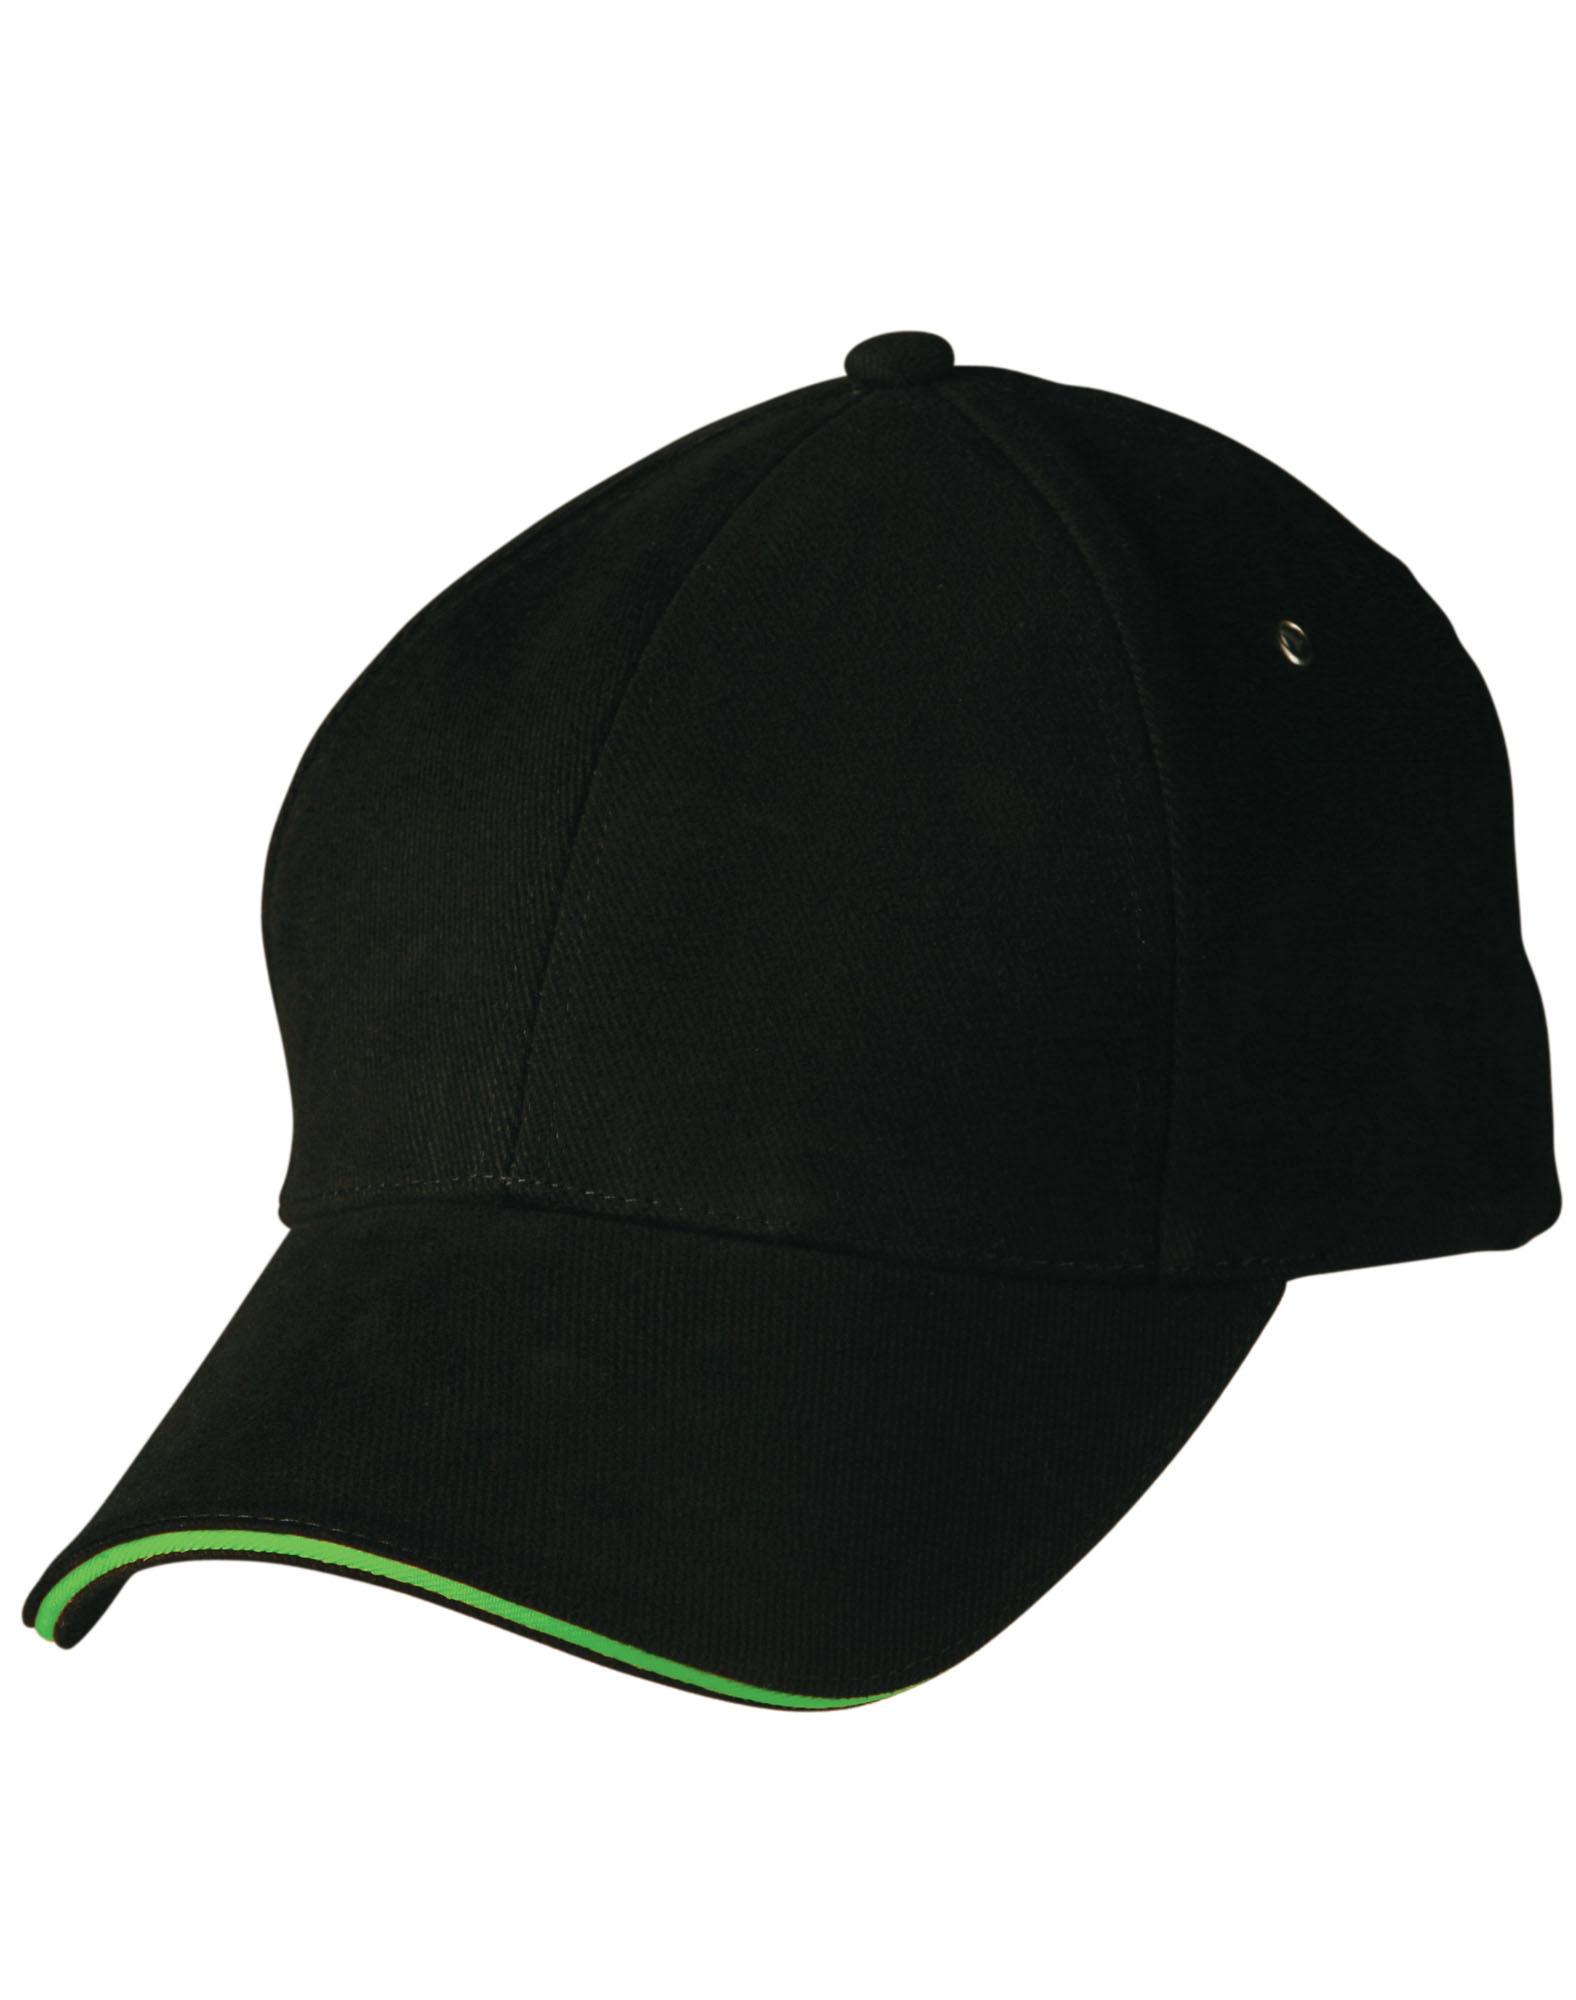 Black.Lime